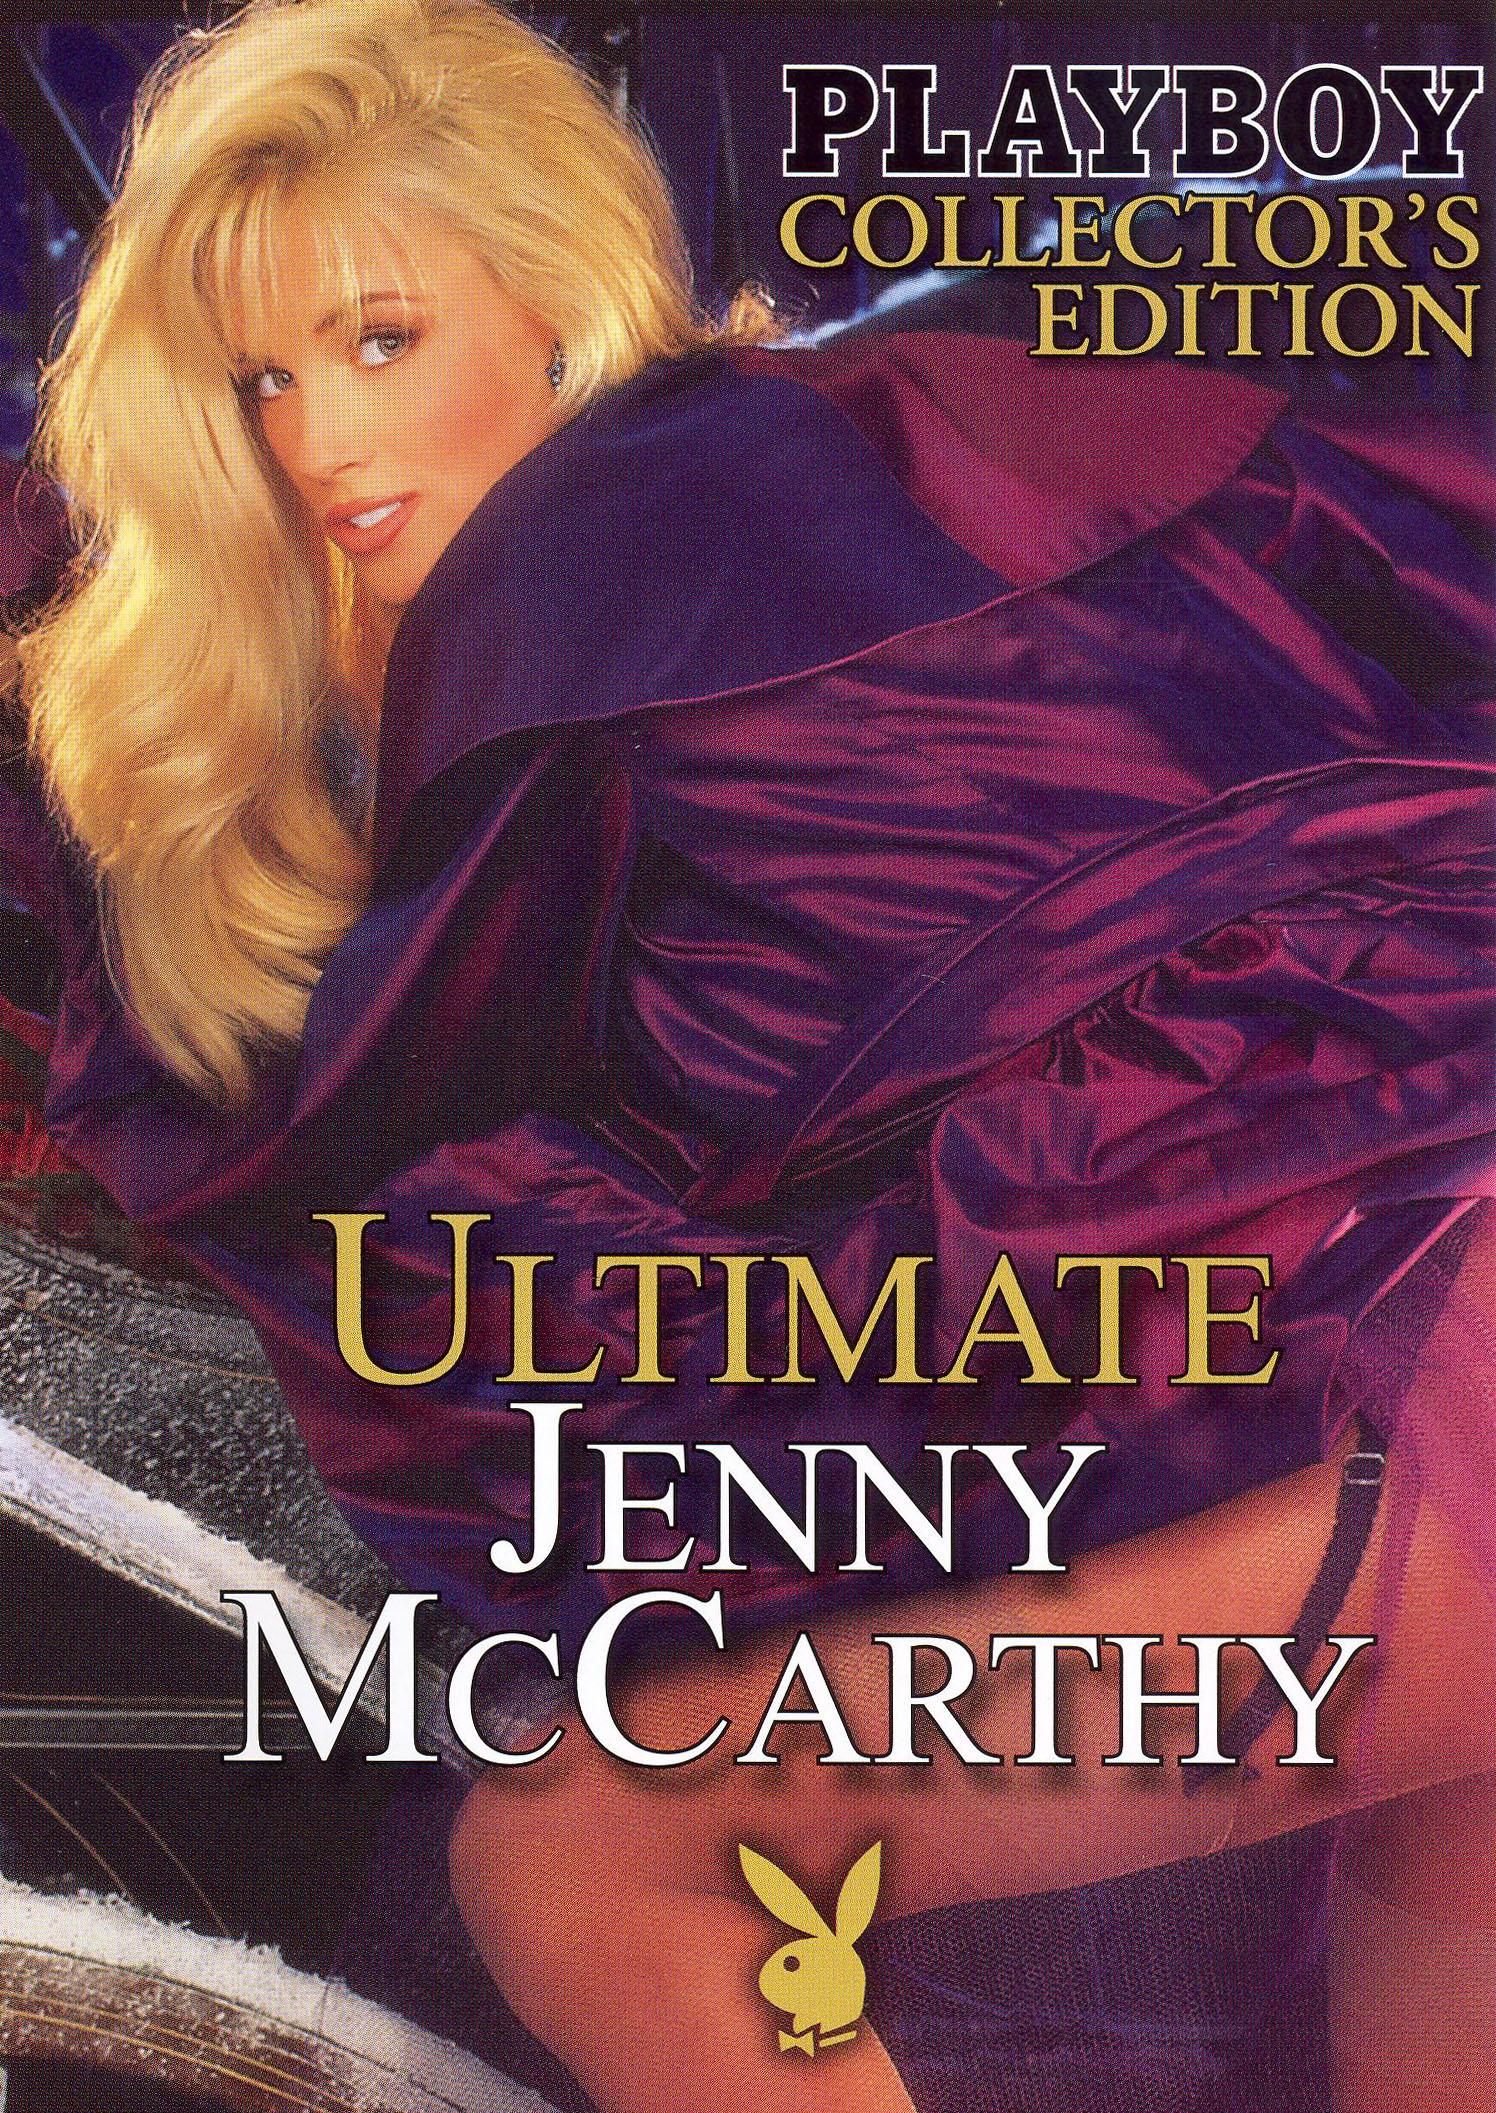 Playboy: The Ultimate Jenny McCarthy